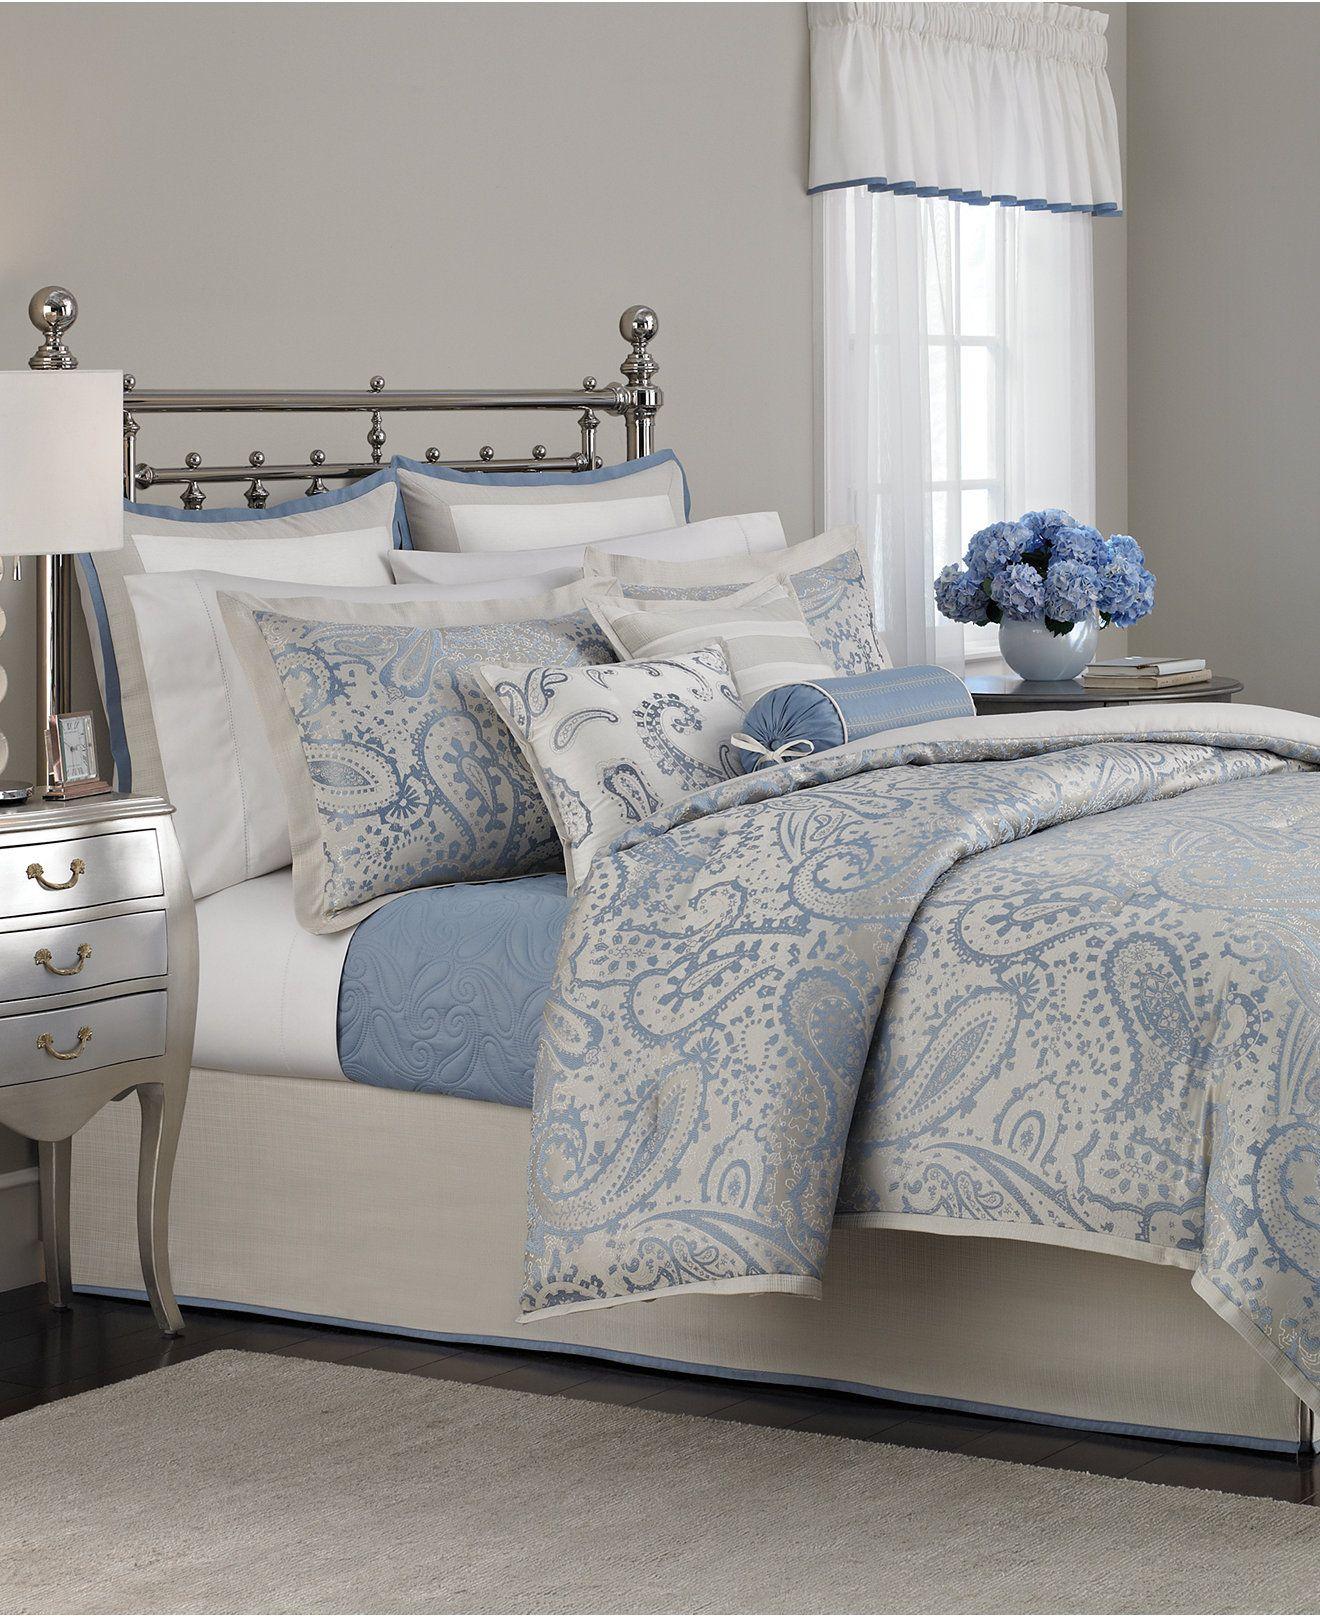 Spa & Cream Bedroom Color Palette Cream bedroom